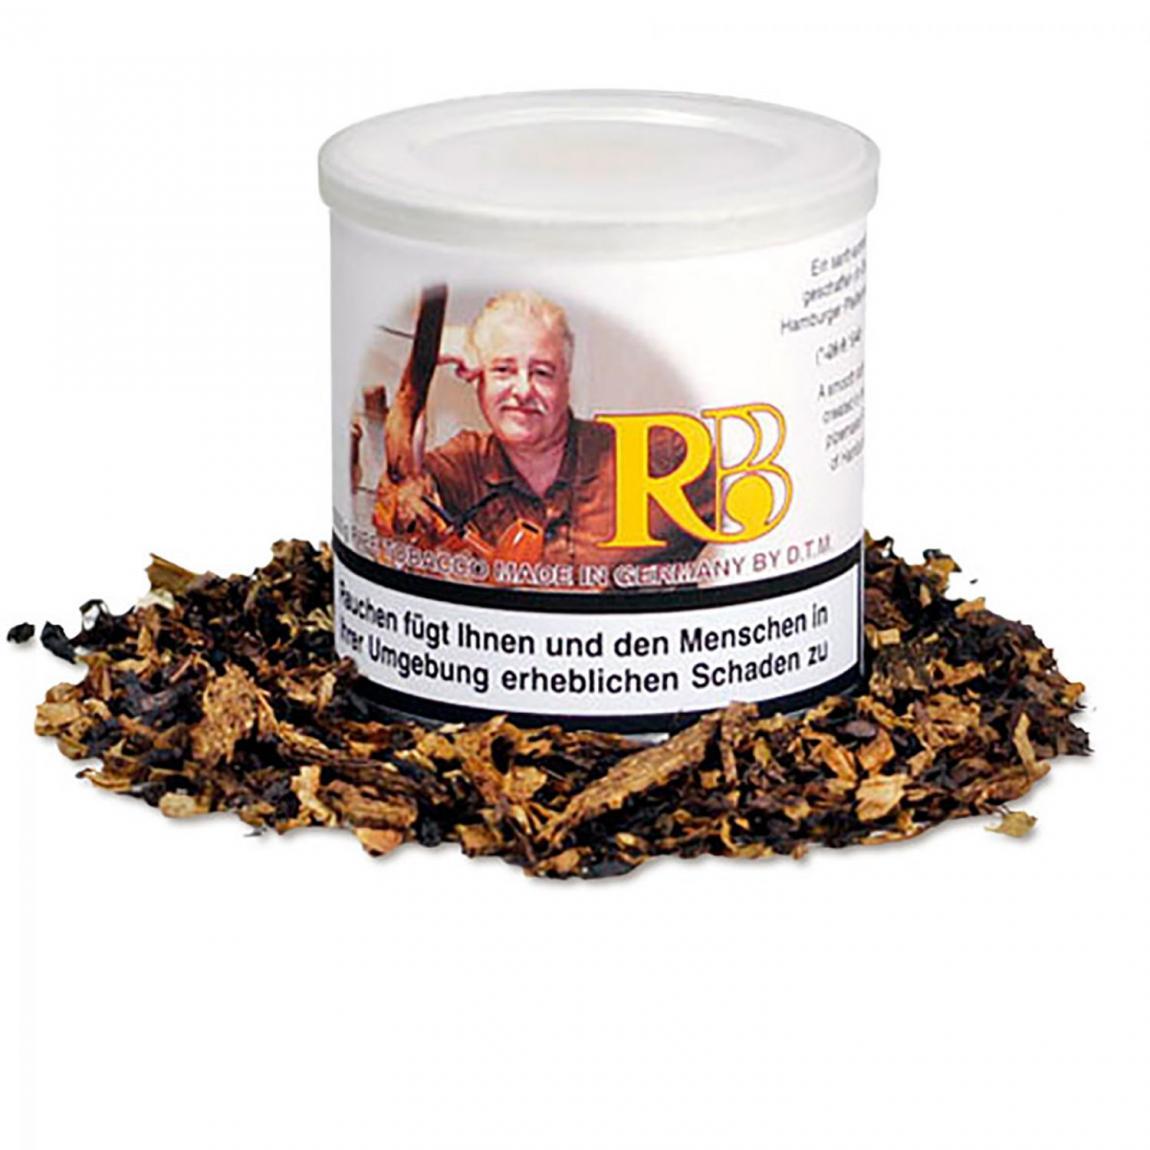 Rainer Barbi Memorial Blend - mit Nuss & Karamell Flavour